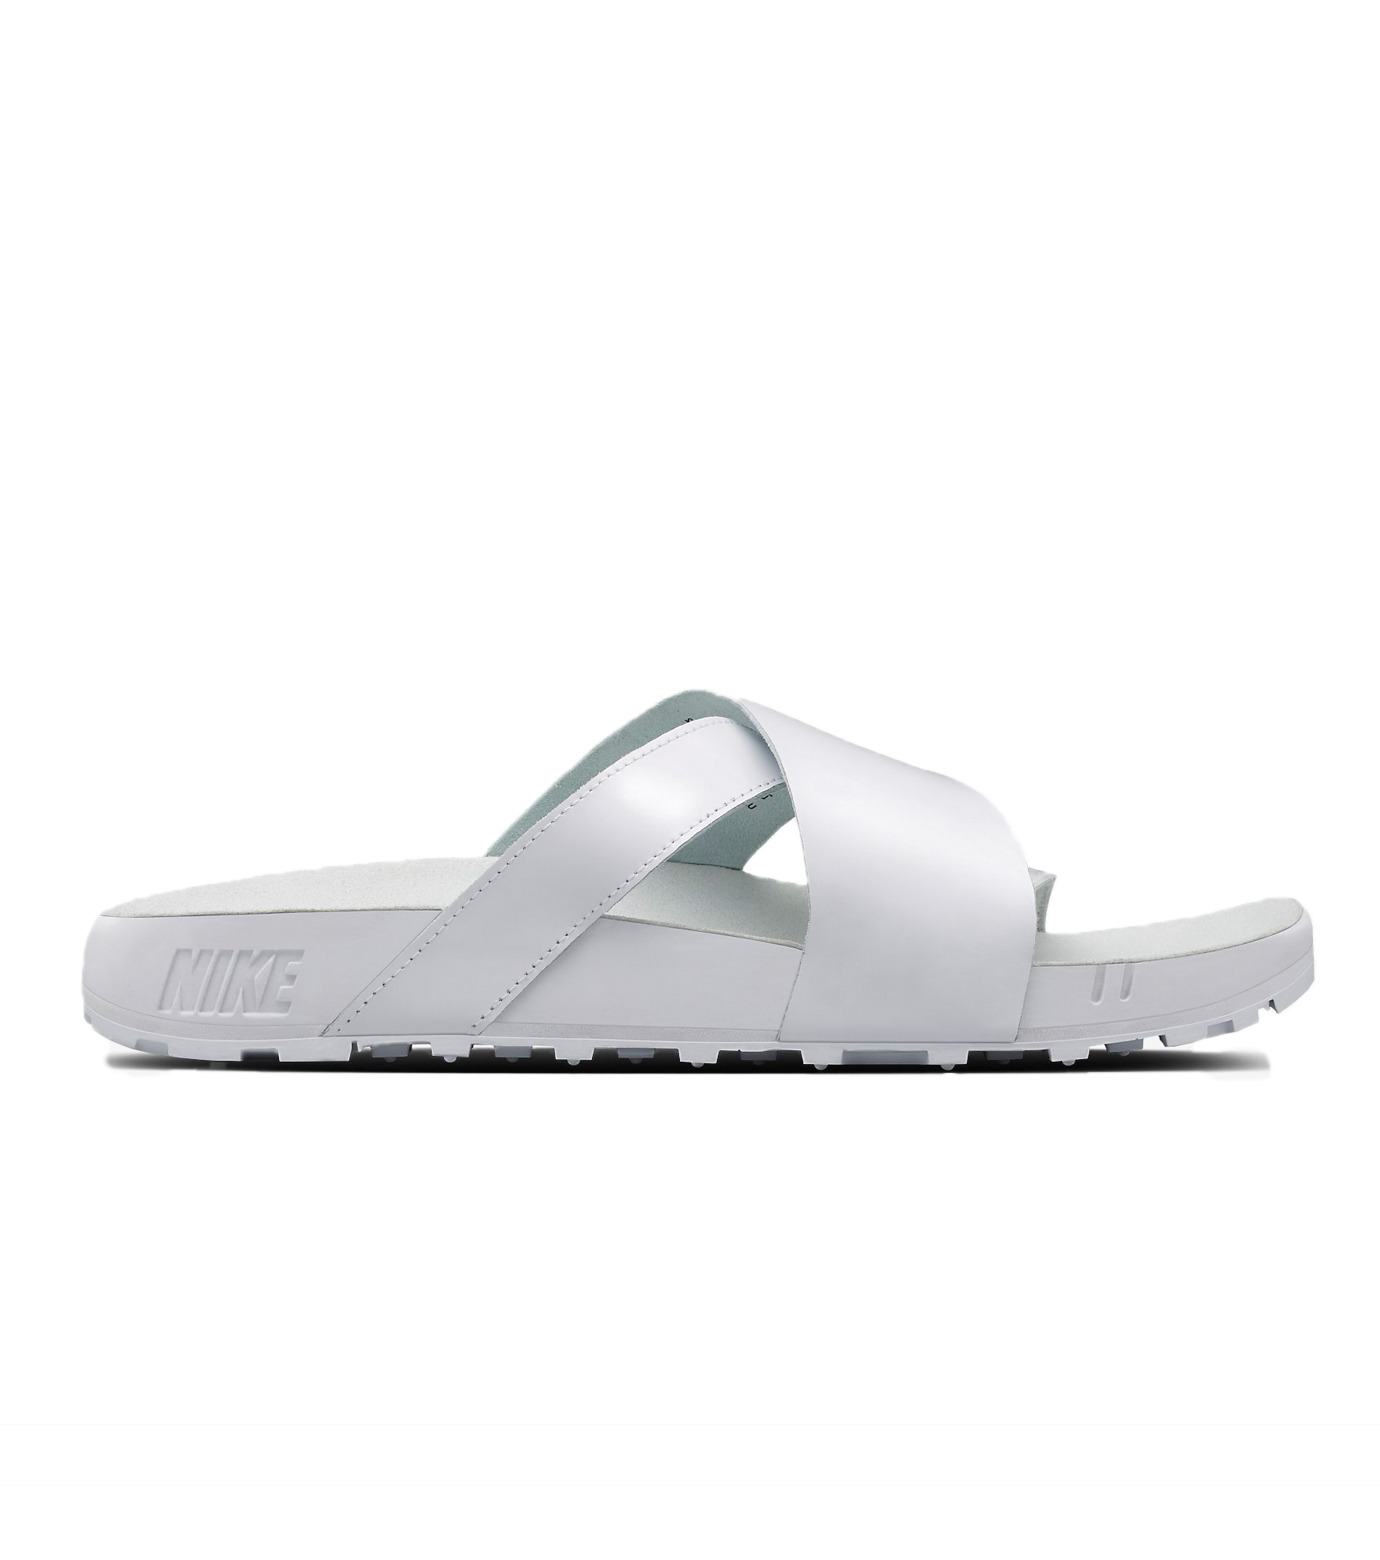 NIKE(ナイキ)のTaupo-WHITE(シューズ/shoes)-849756-100-4 拡大詳細画像1